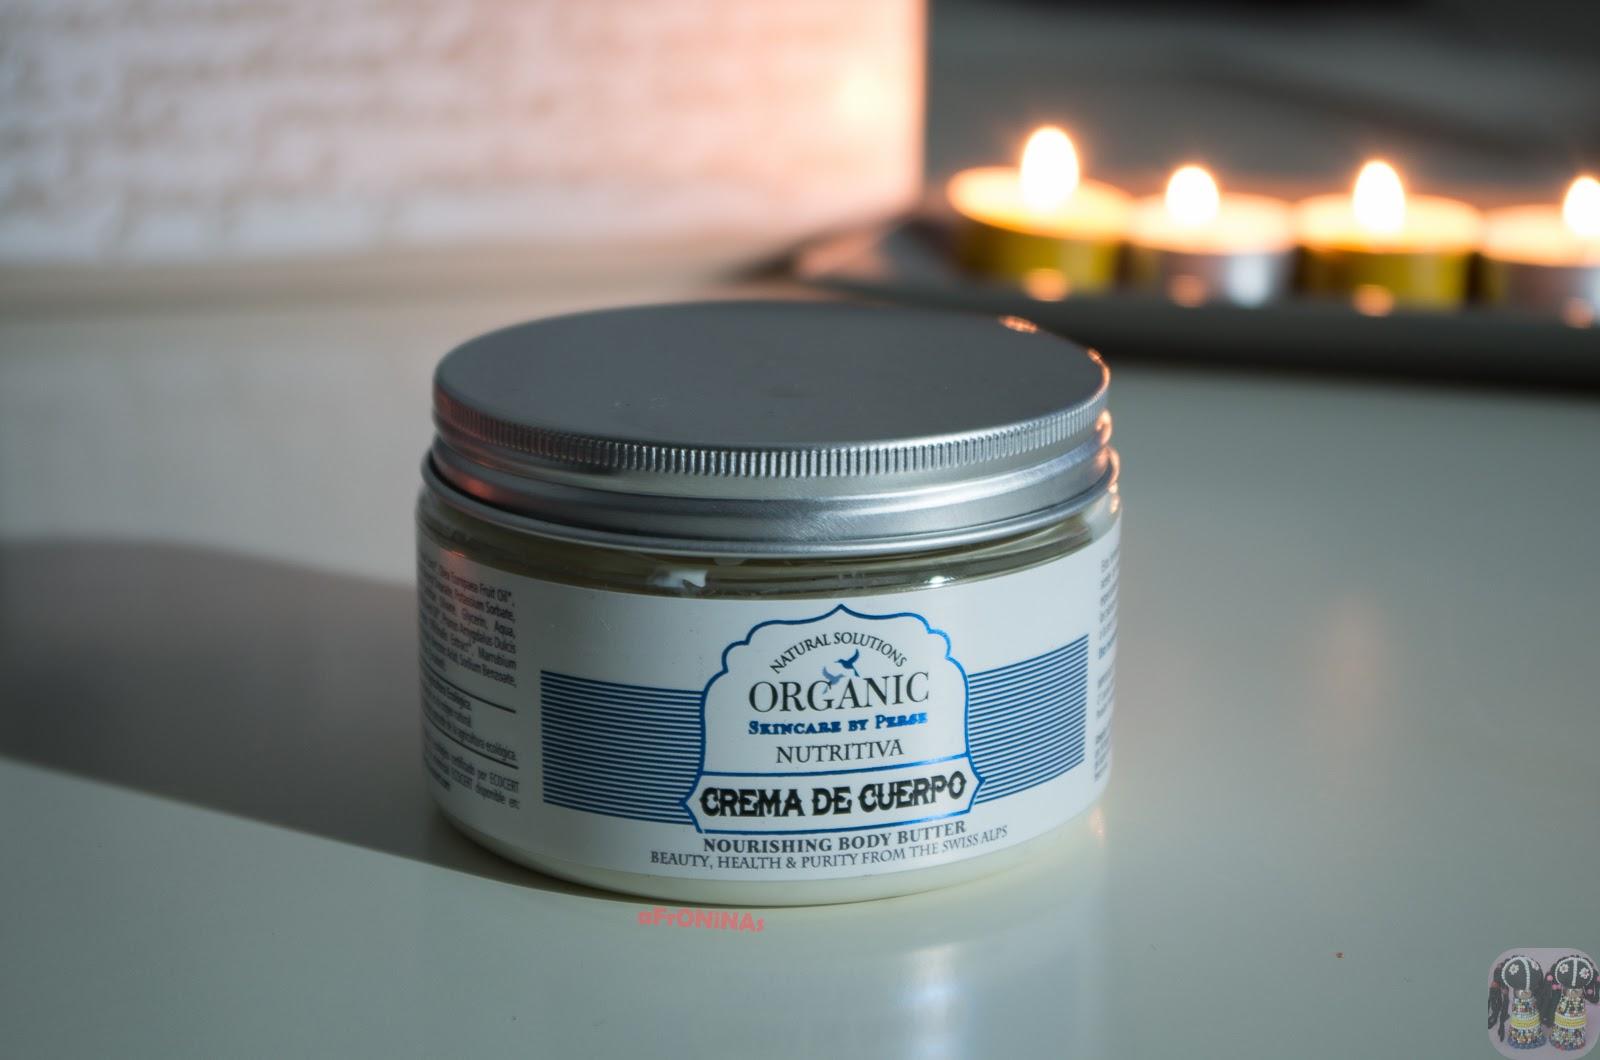 natural solutions organic skincare persé crema corporal hidratante opinion blog